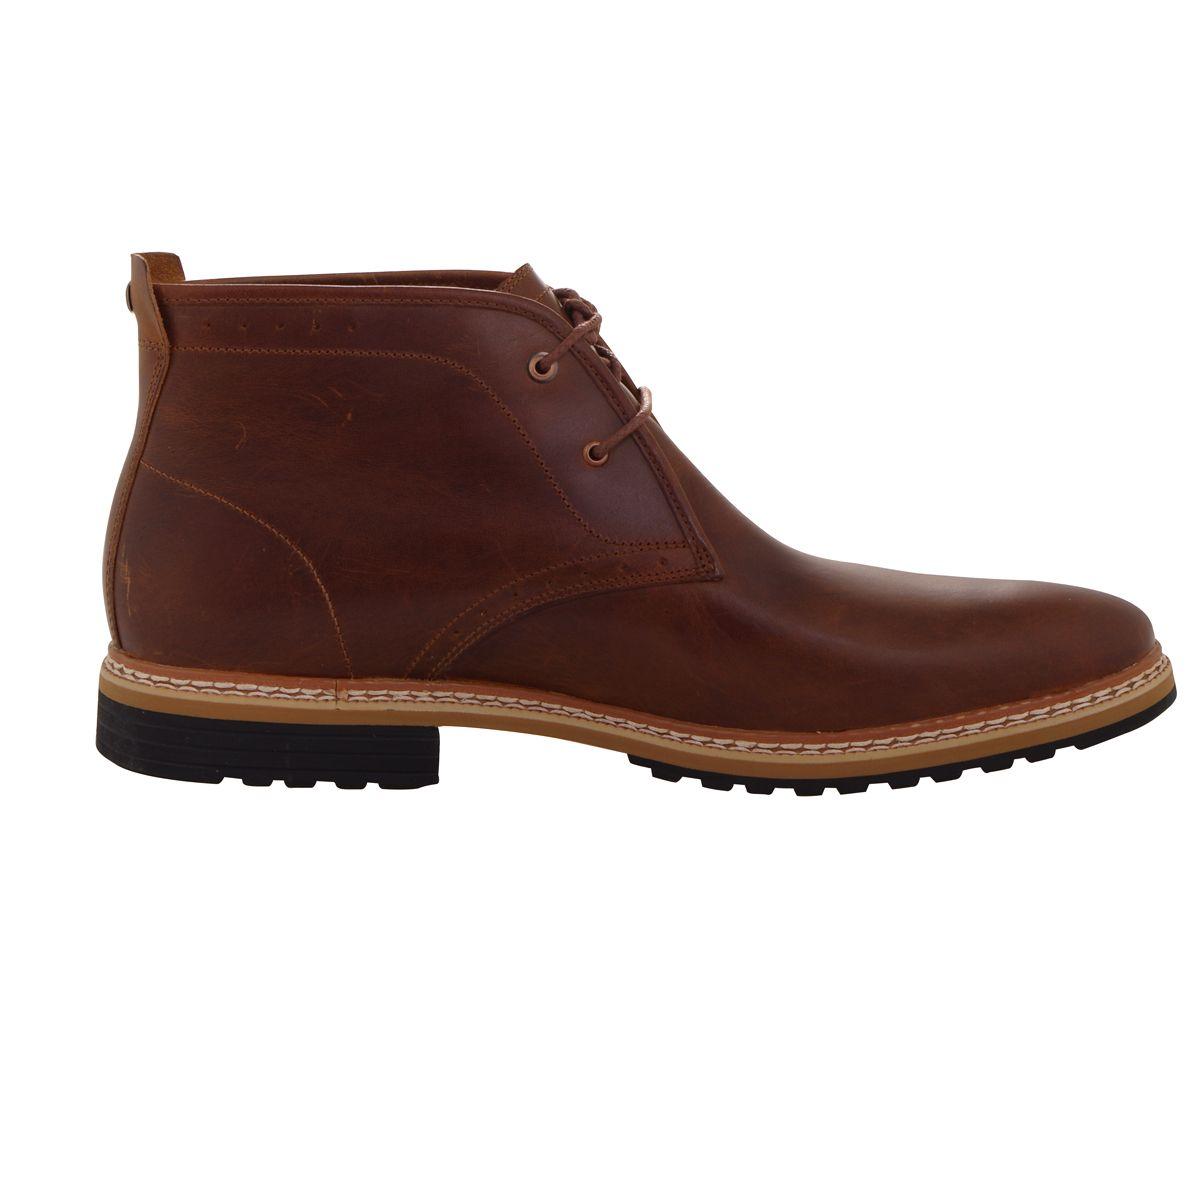 chaussures pt chukka marrons grande taille du 46 au 50. Black Bedroom Furniture Sets. Home Design Ideas